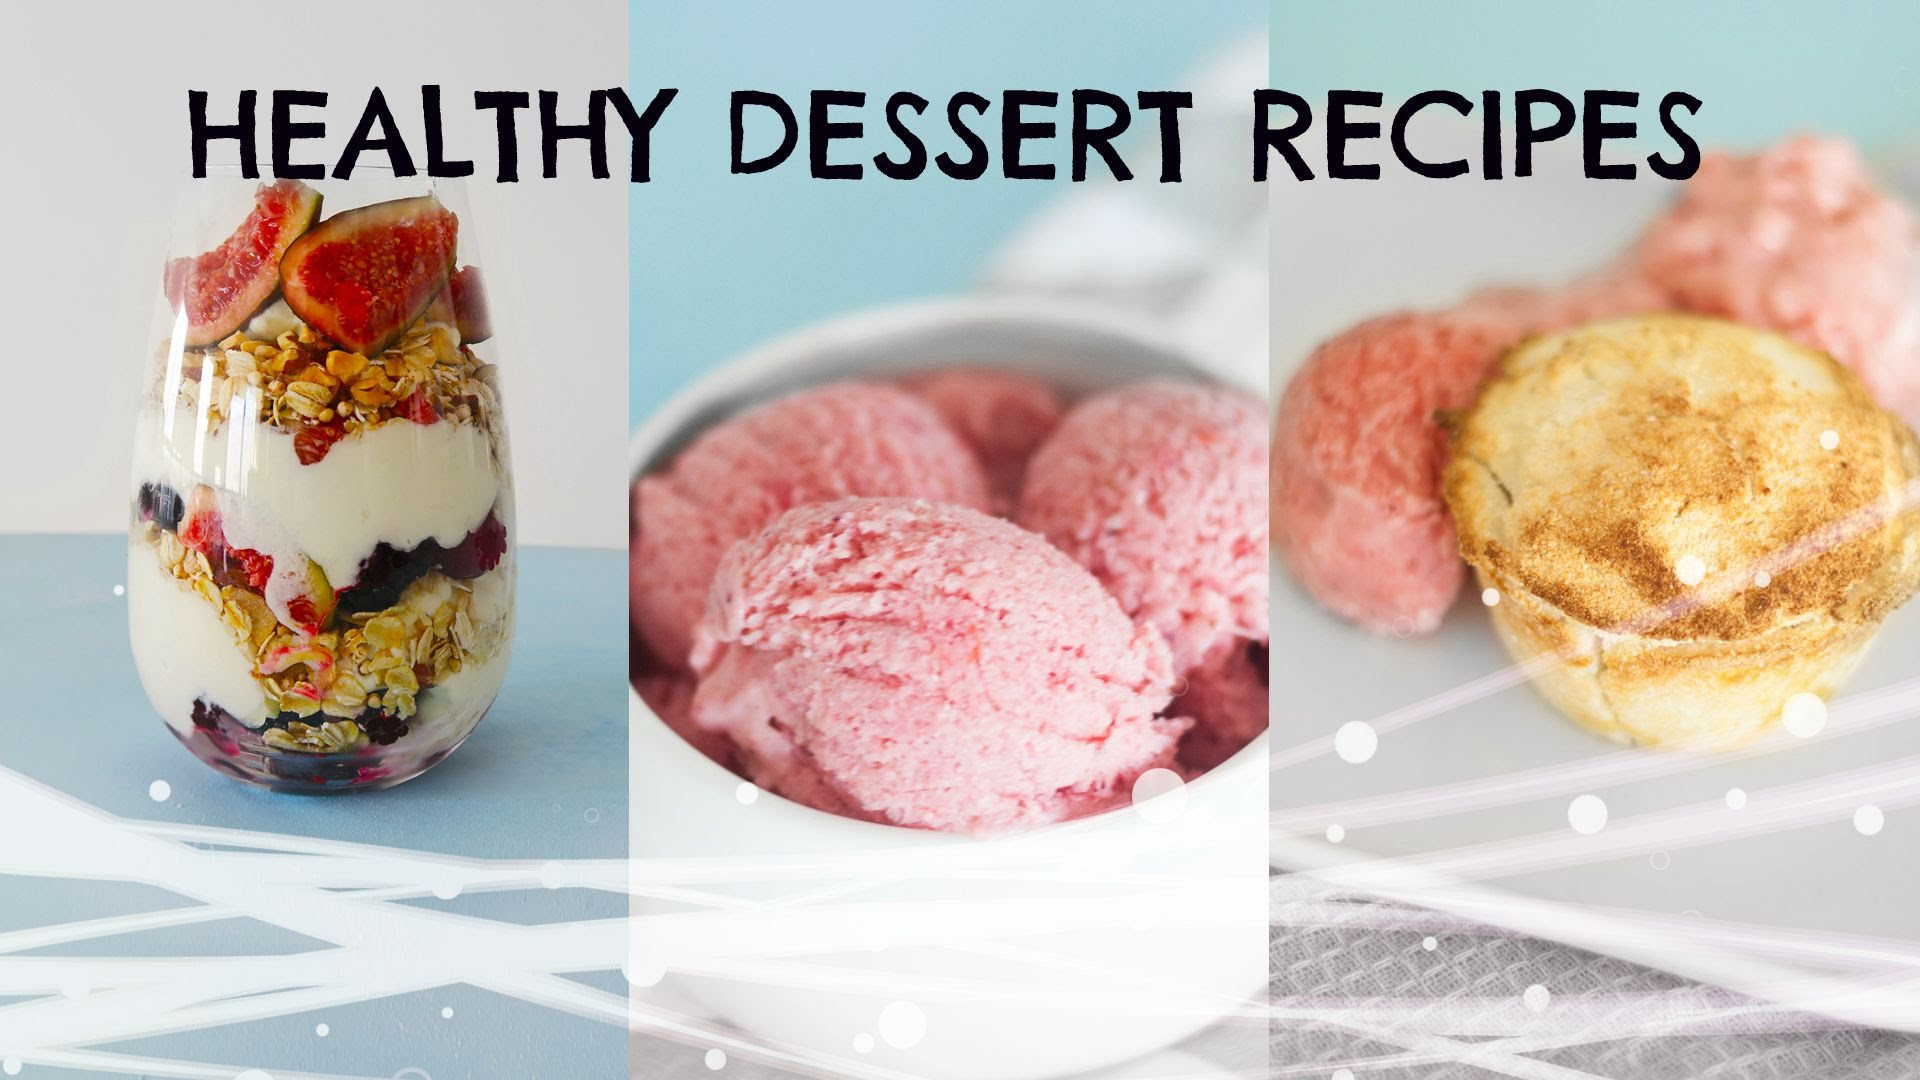 Healthy Dessert Ideas Easy  Healthy DESSERT Recipes simple sweets Rachel Aust